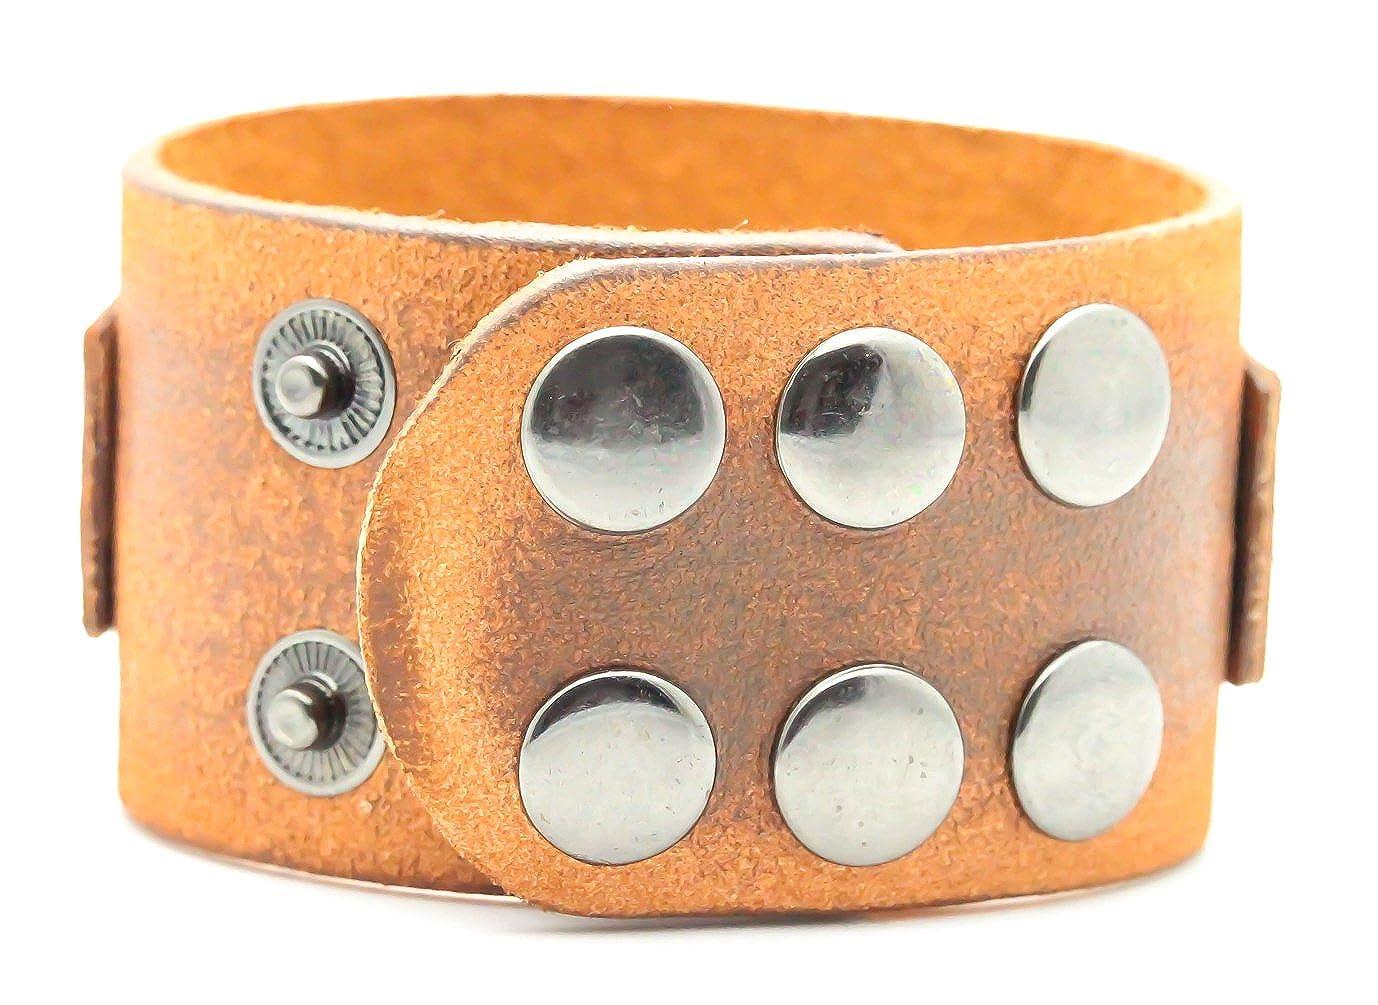 Fusamk Hip Hop Alloy Skull Rivet Snap Wristband Leather Bracelet Bangle,7.0-8.0inches